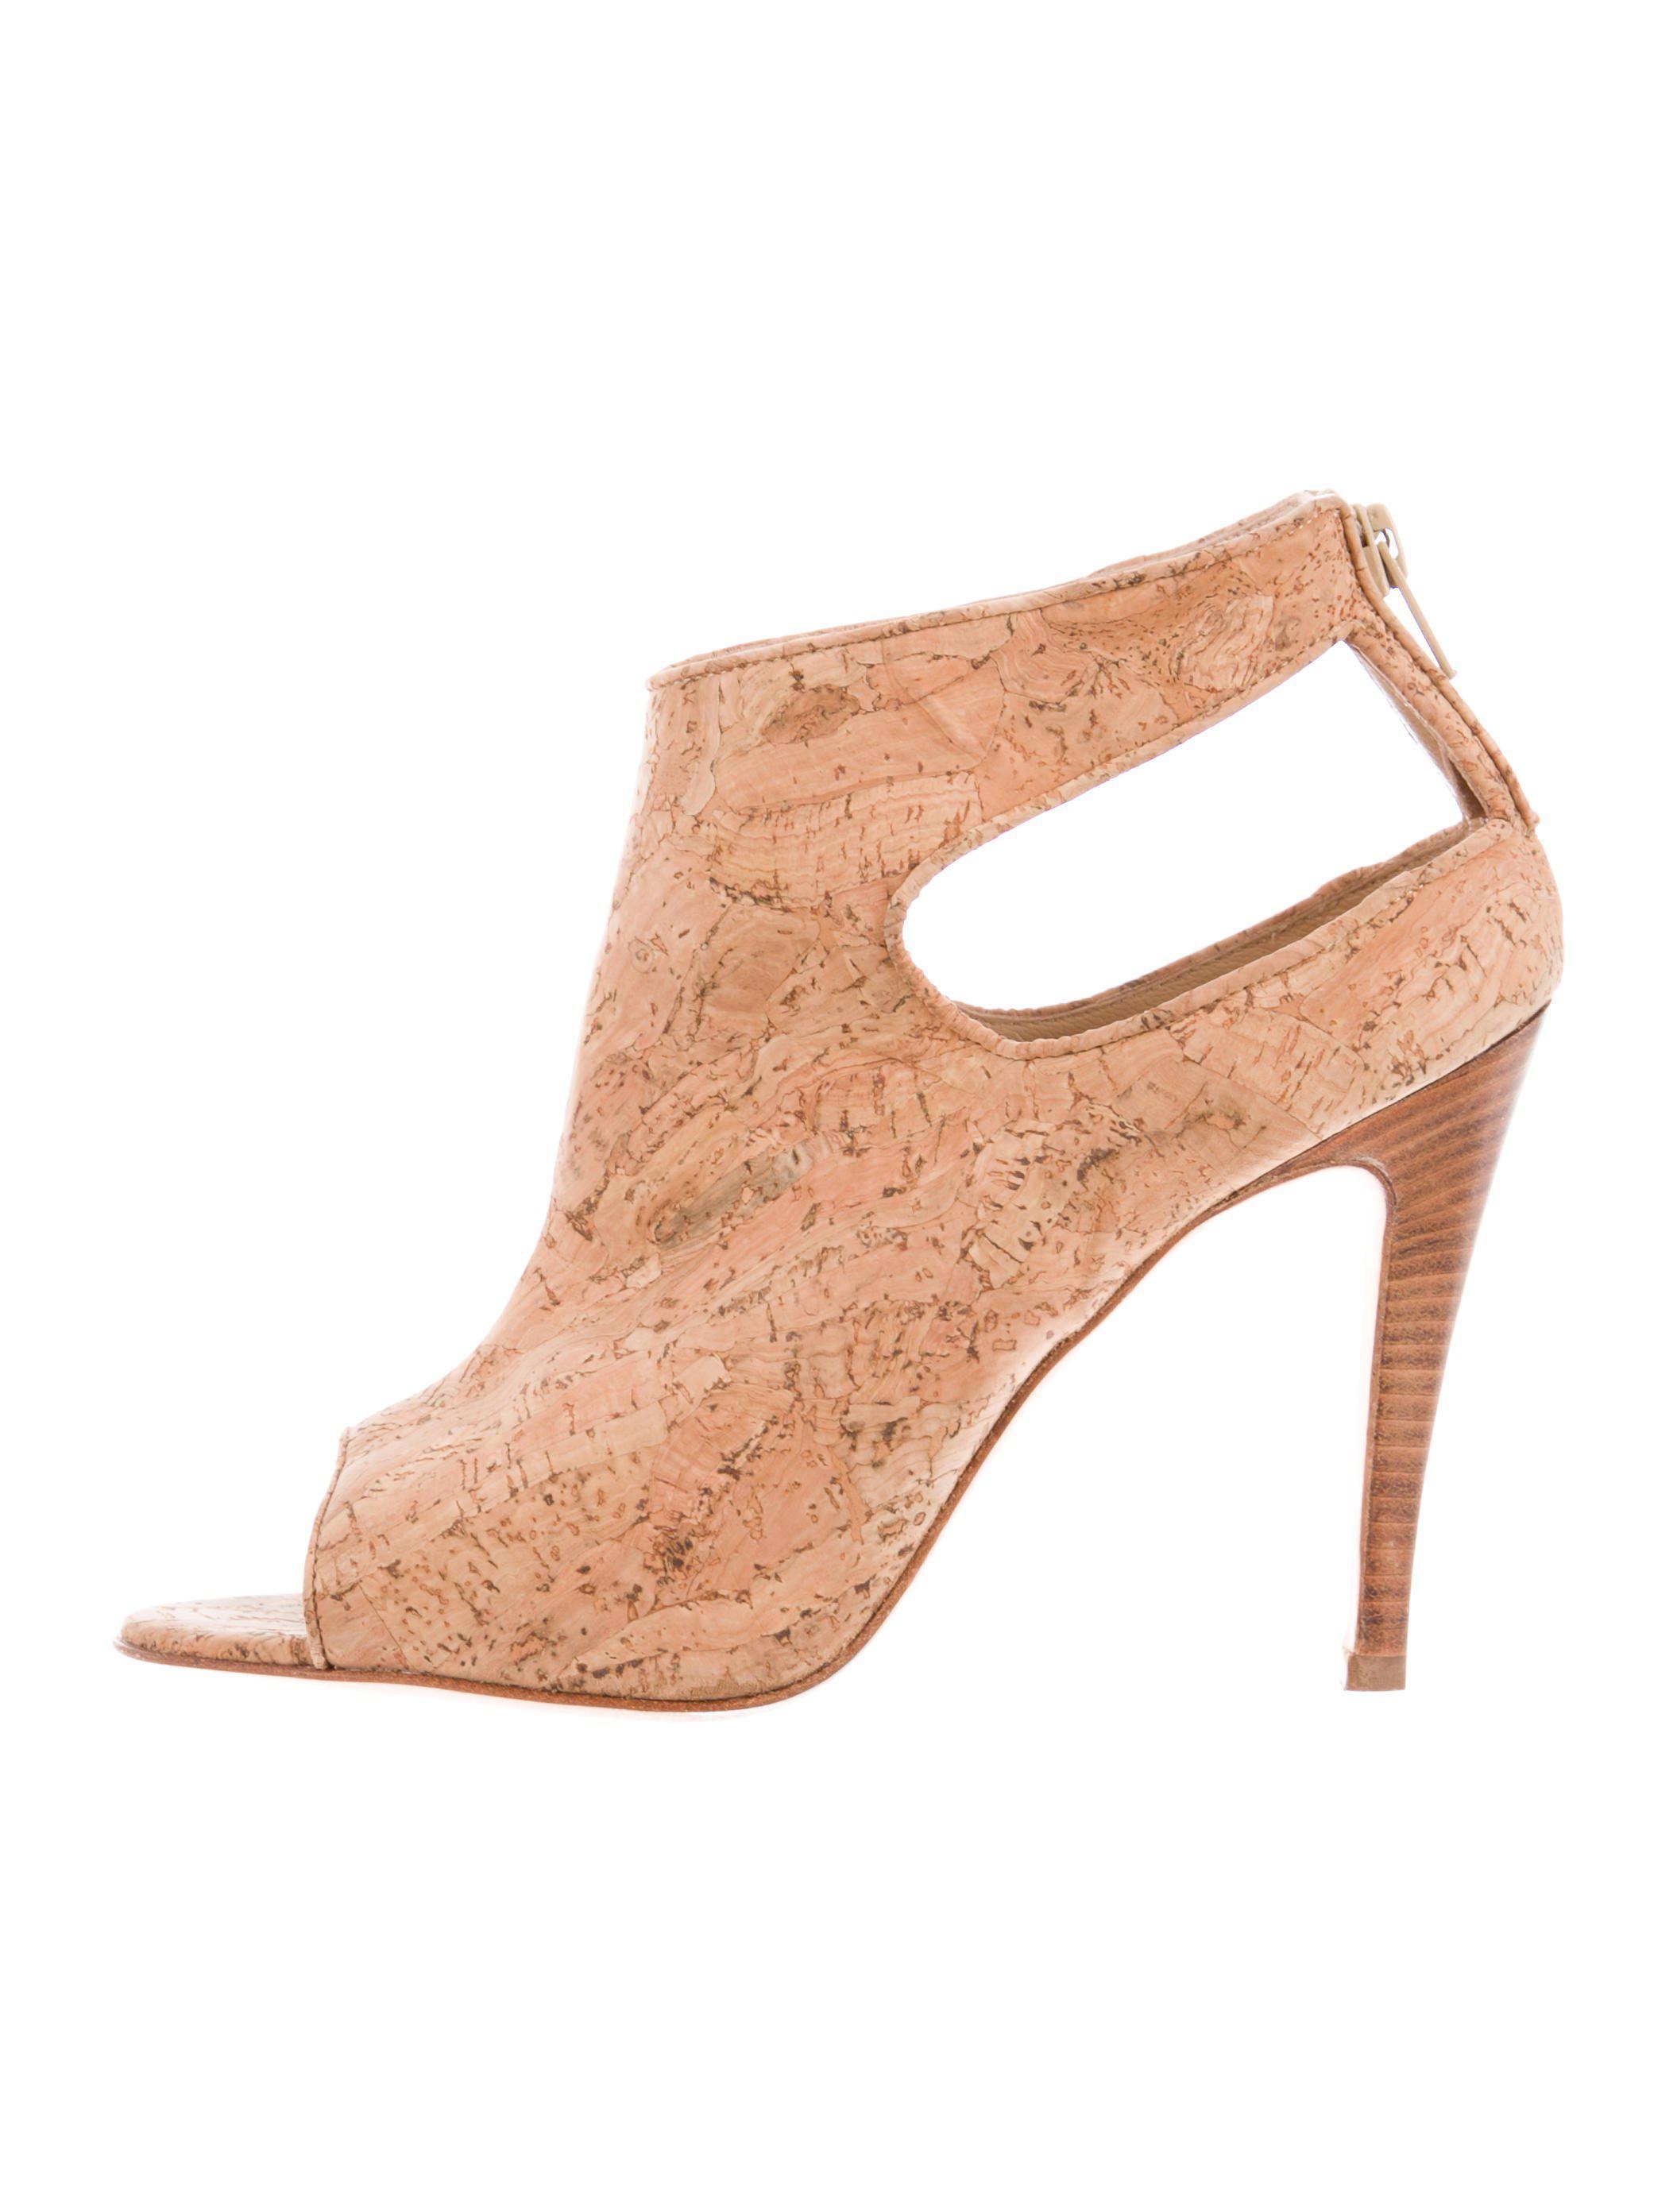 060718169ee Lyst - Manolo Blahnik Cork Cutout Sandals Tan in Natural